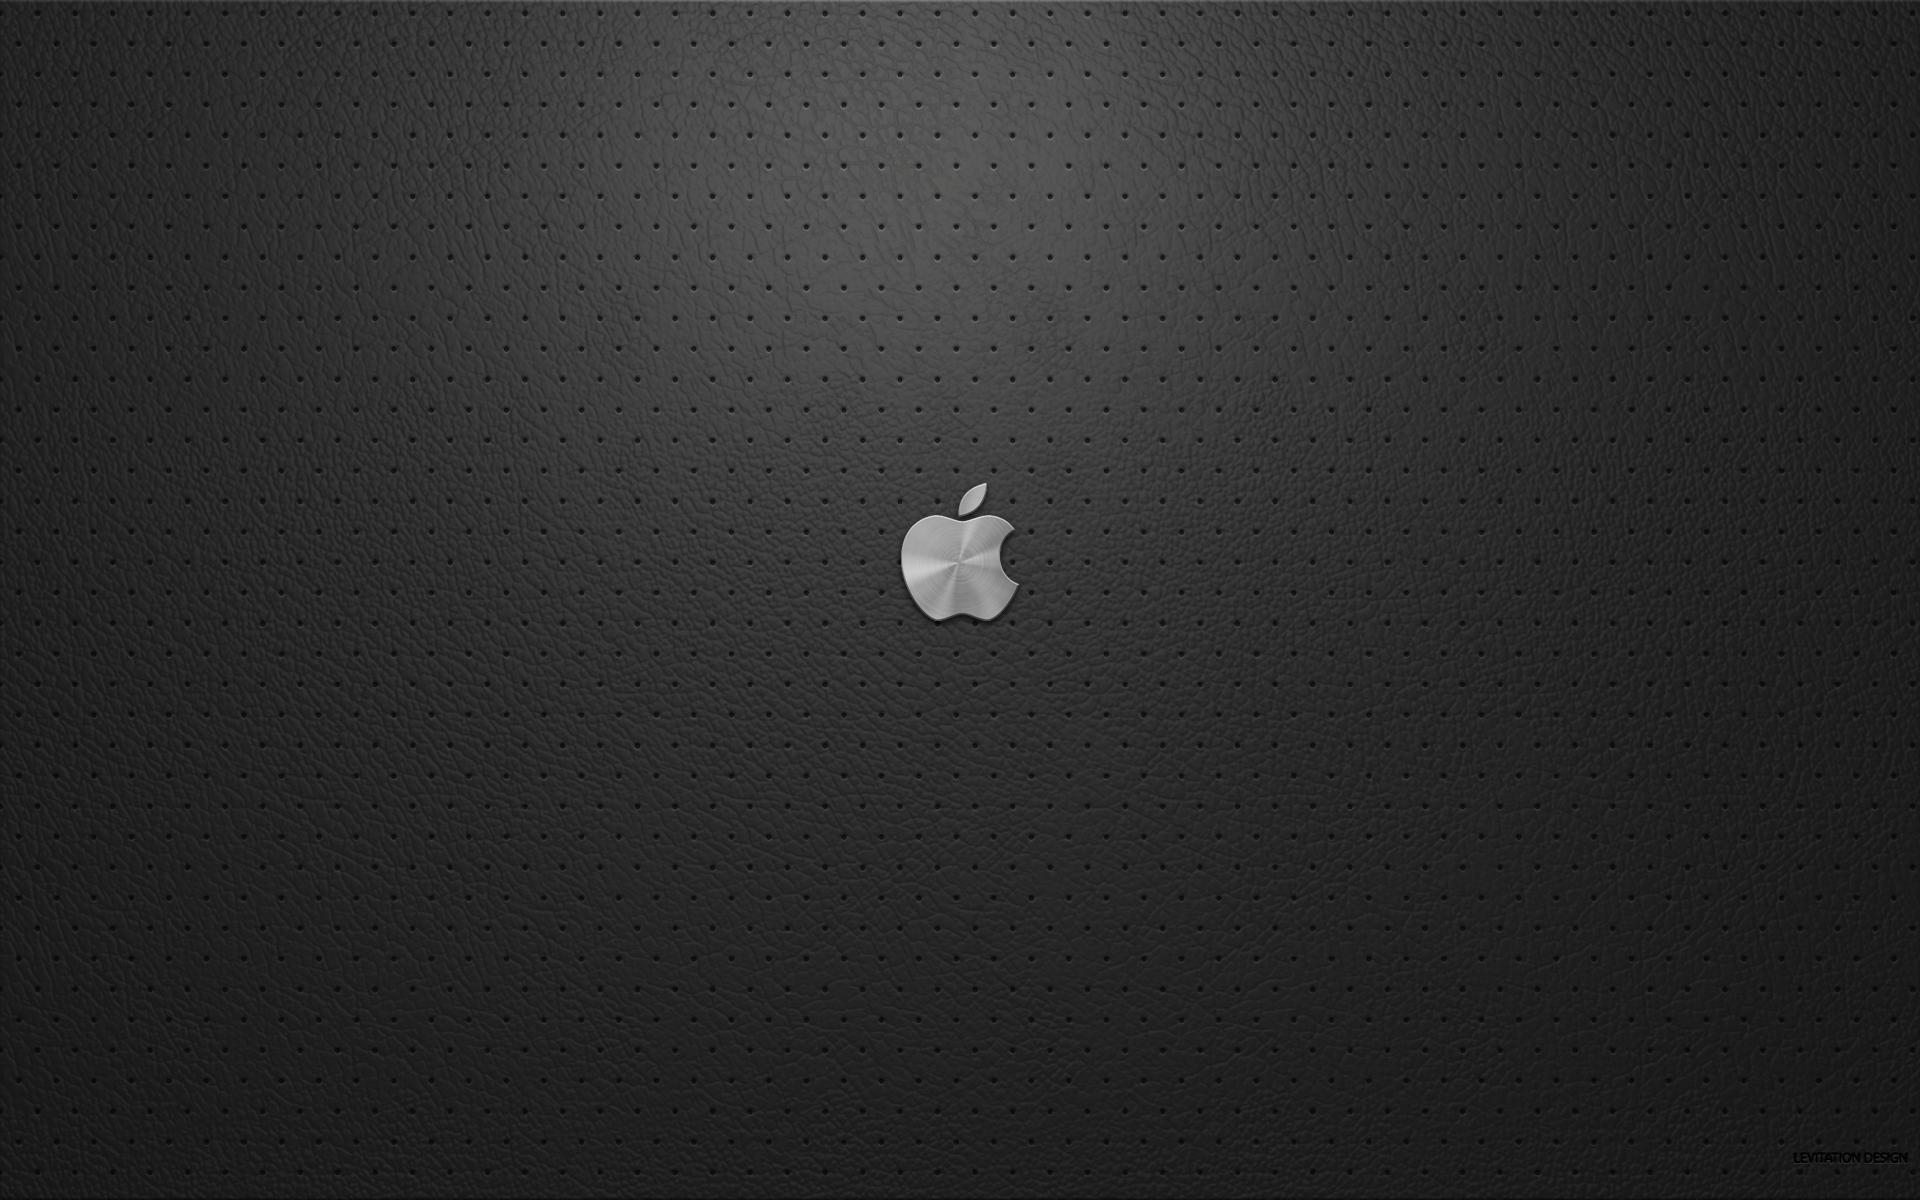 Wallpapers mac apple taringa for Sfondo apple hd